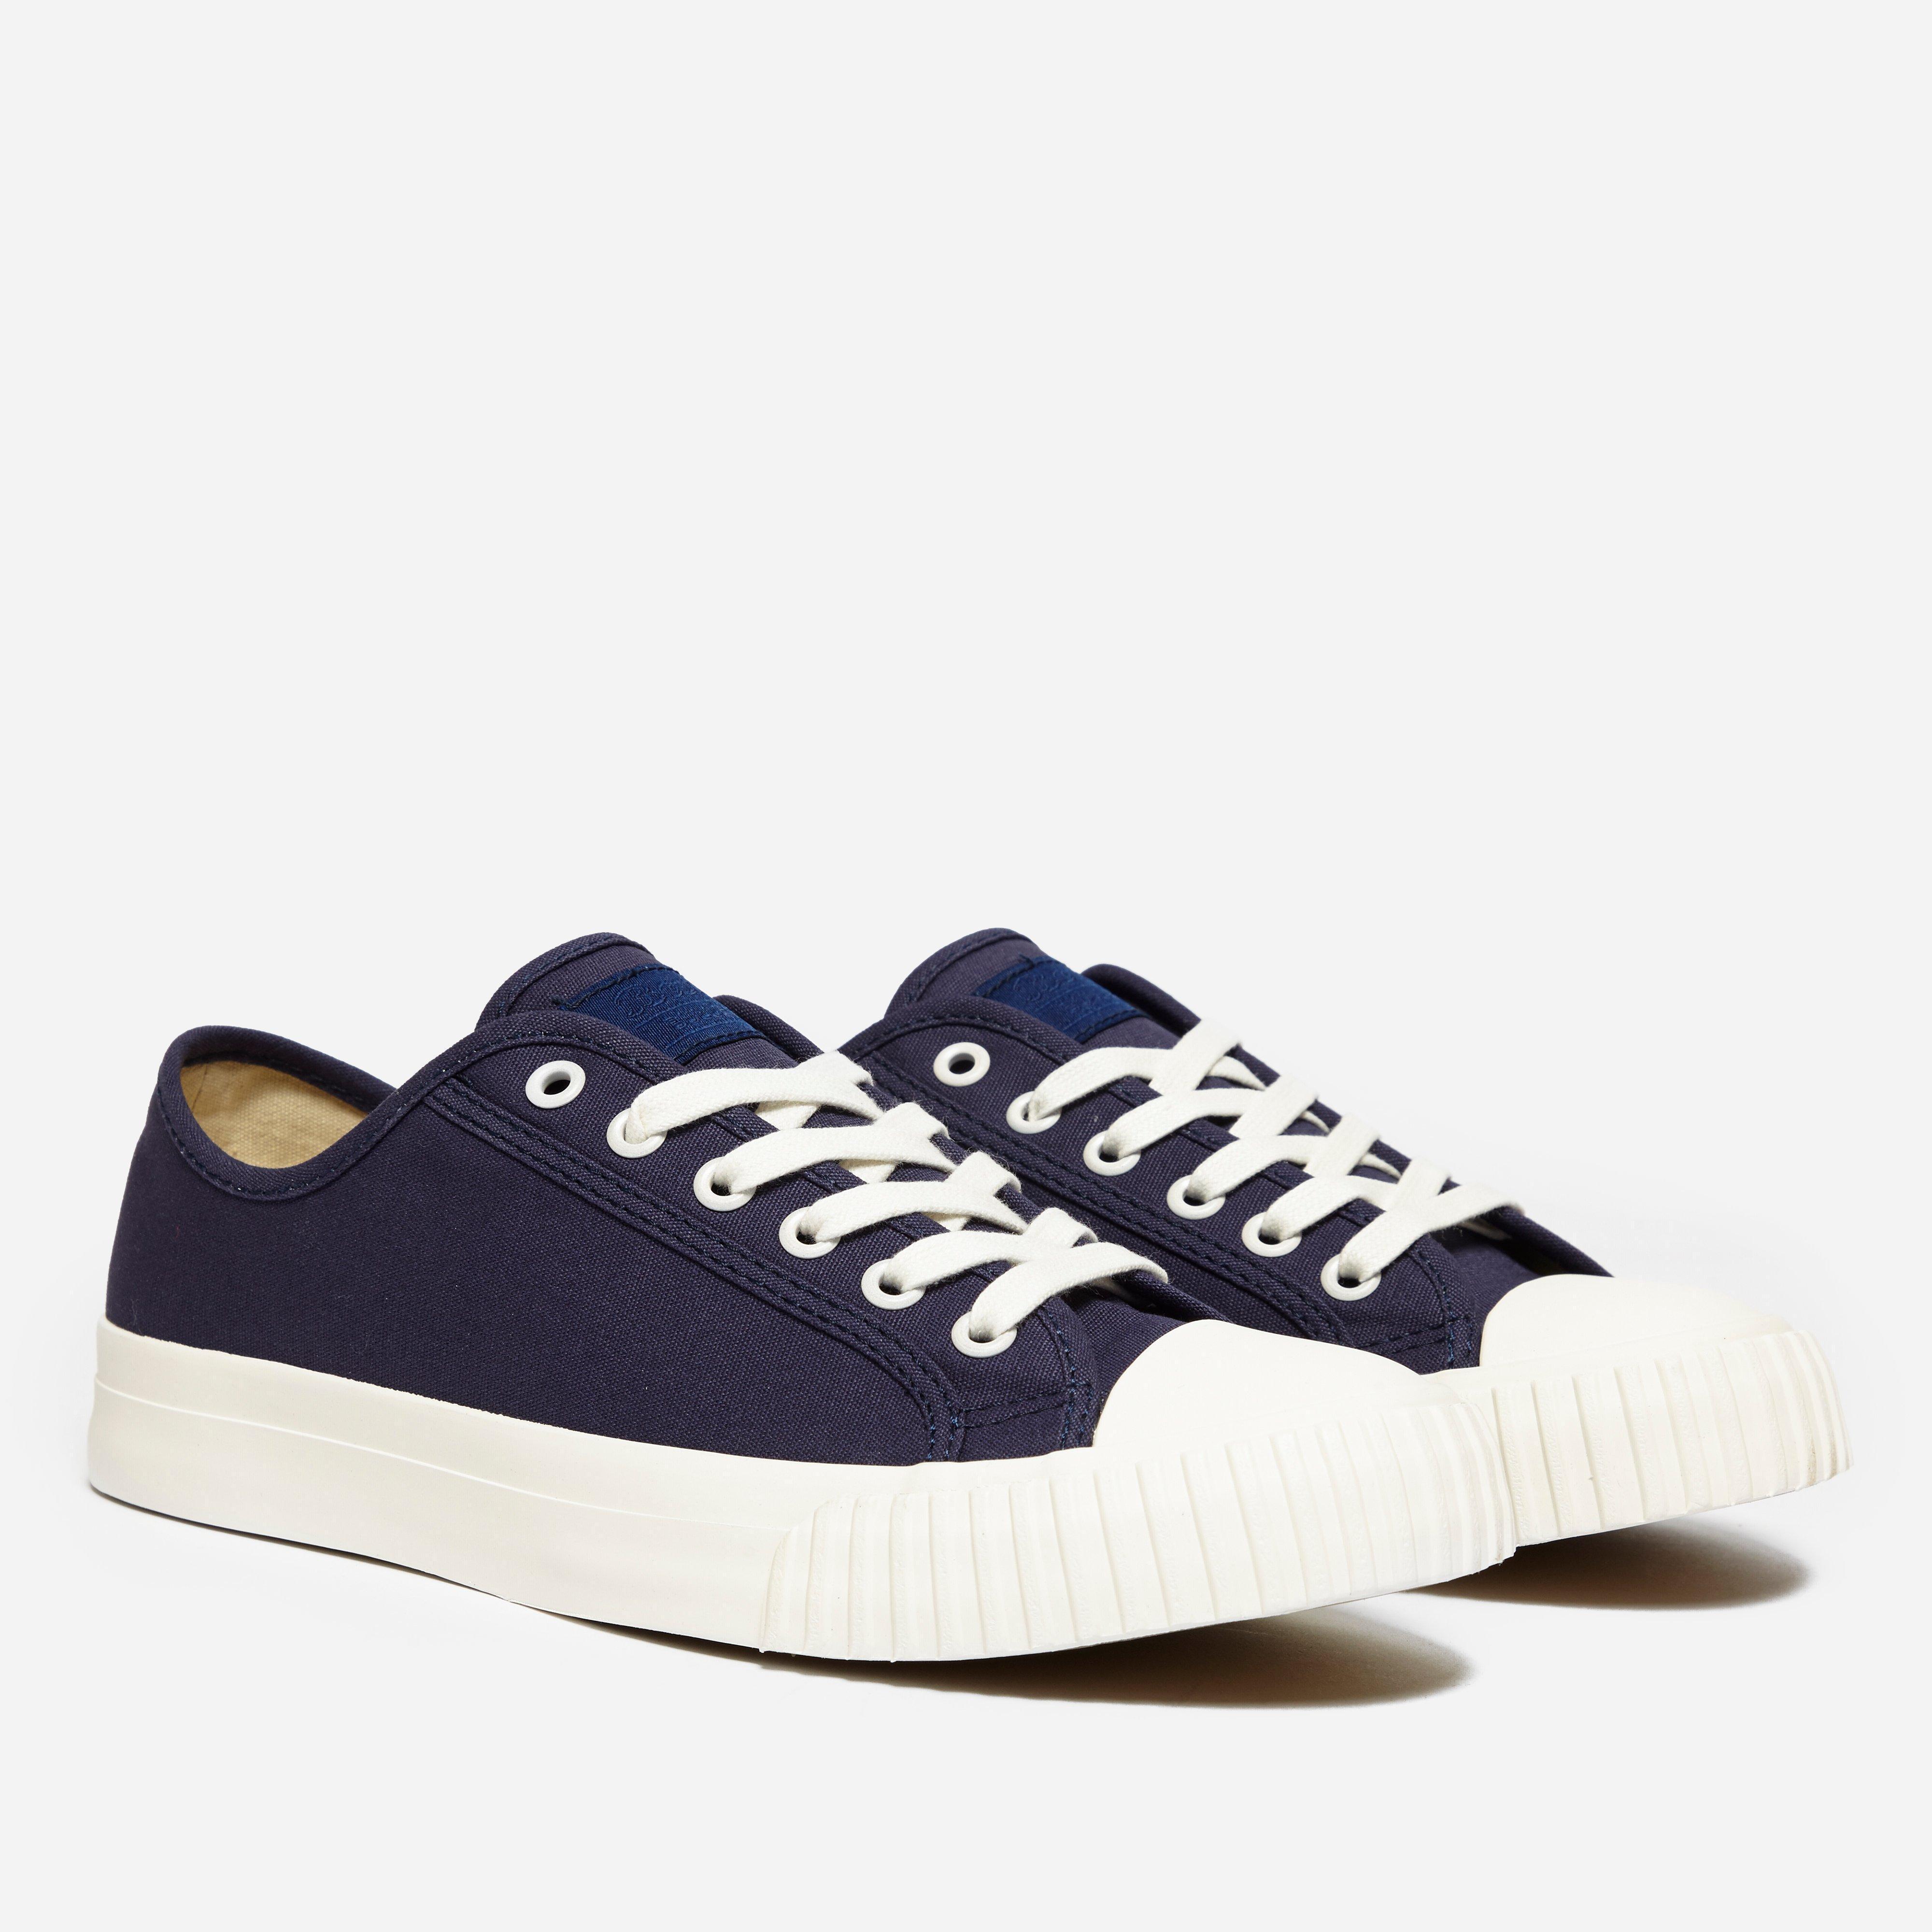 Bata New Shoes Bd